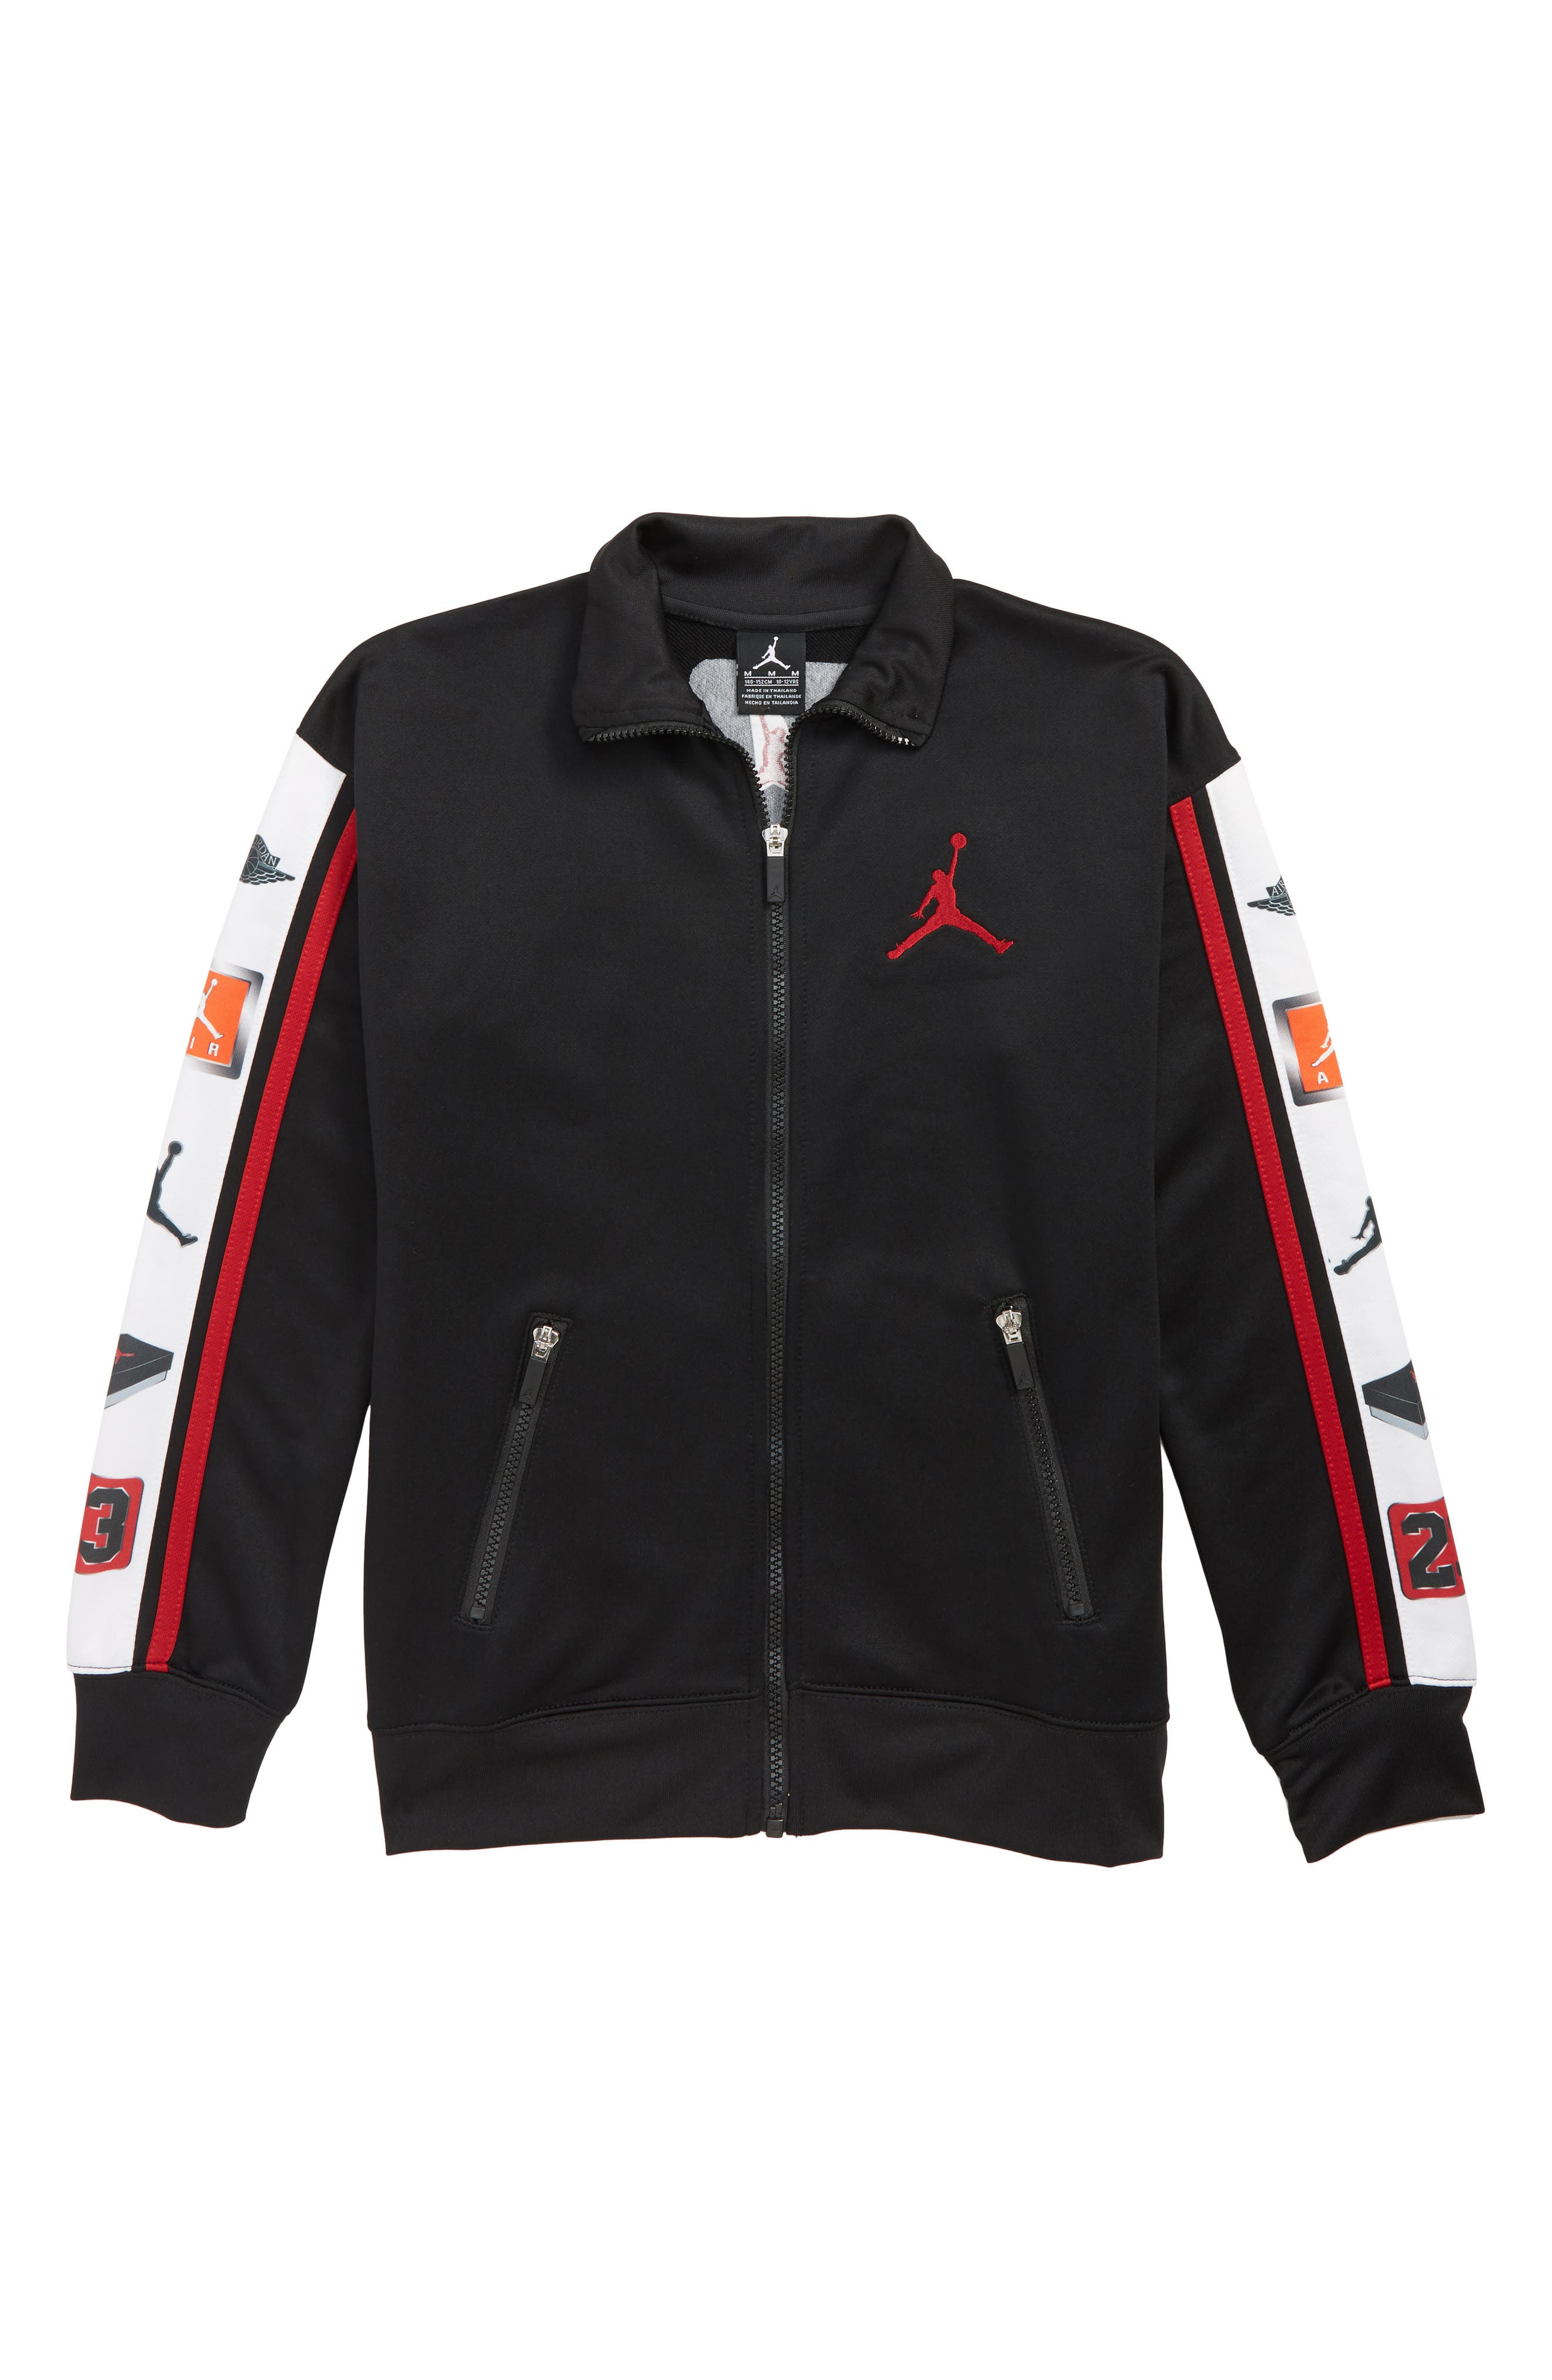 Jordan Celebrity Air Jordan Track Jacket,                             Main thumbnail 1, color,                             BLACK